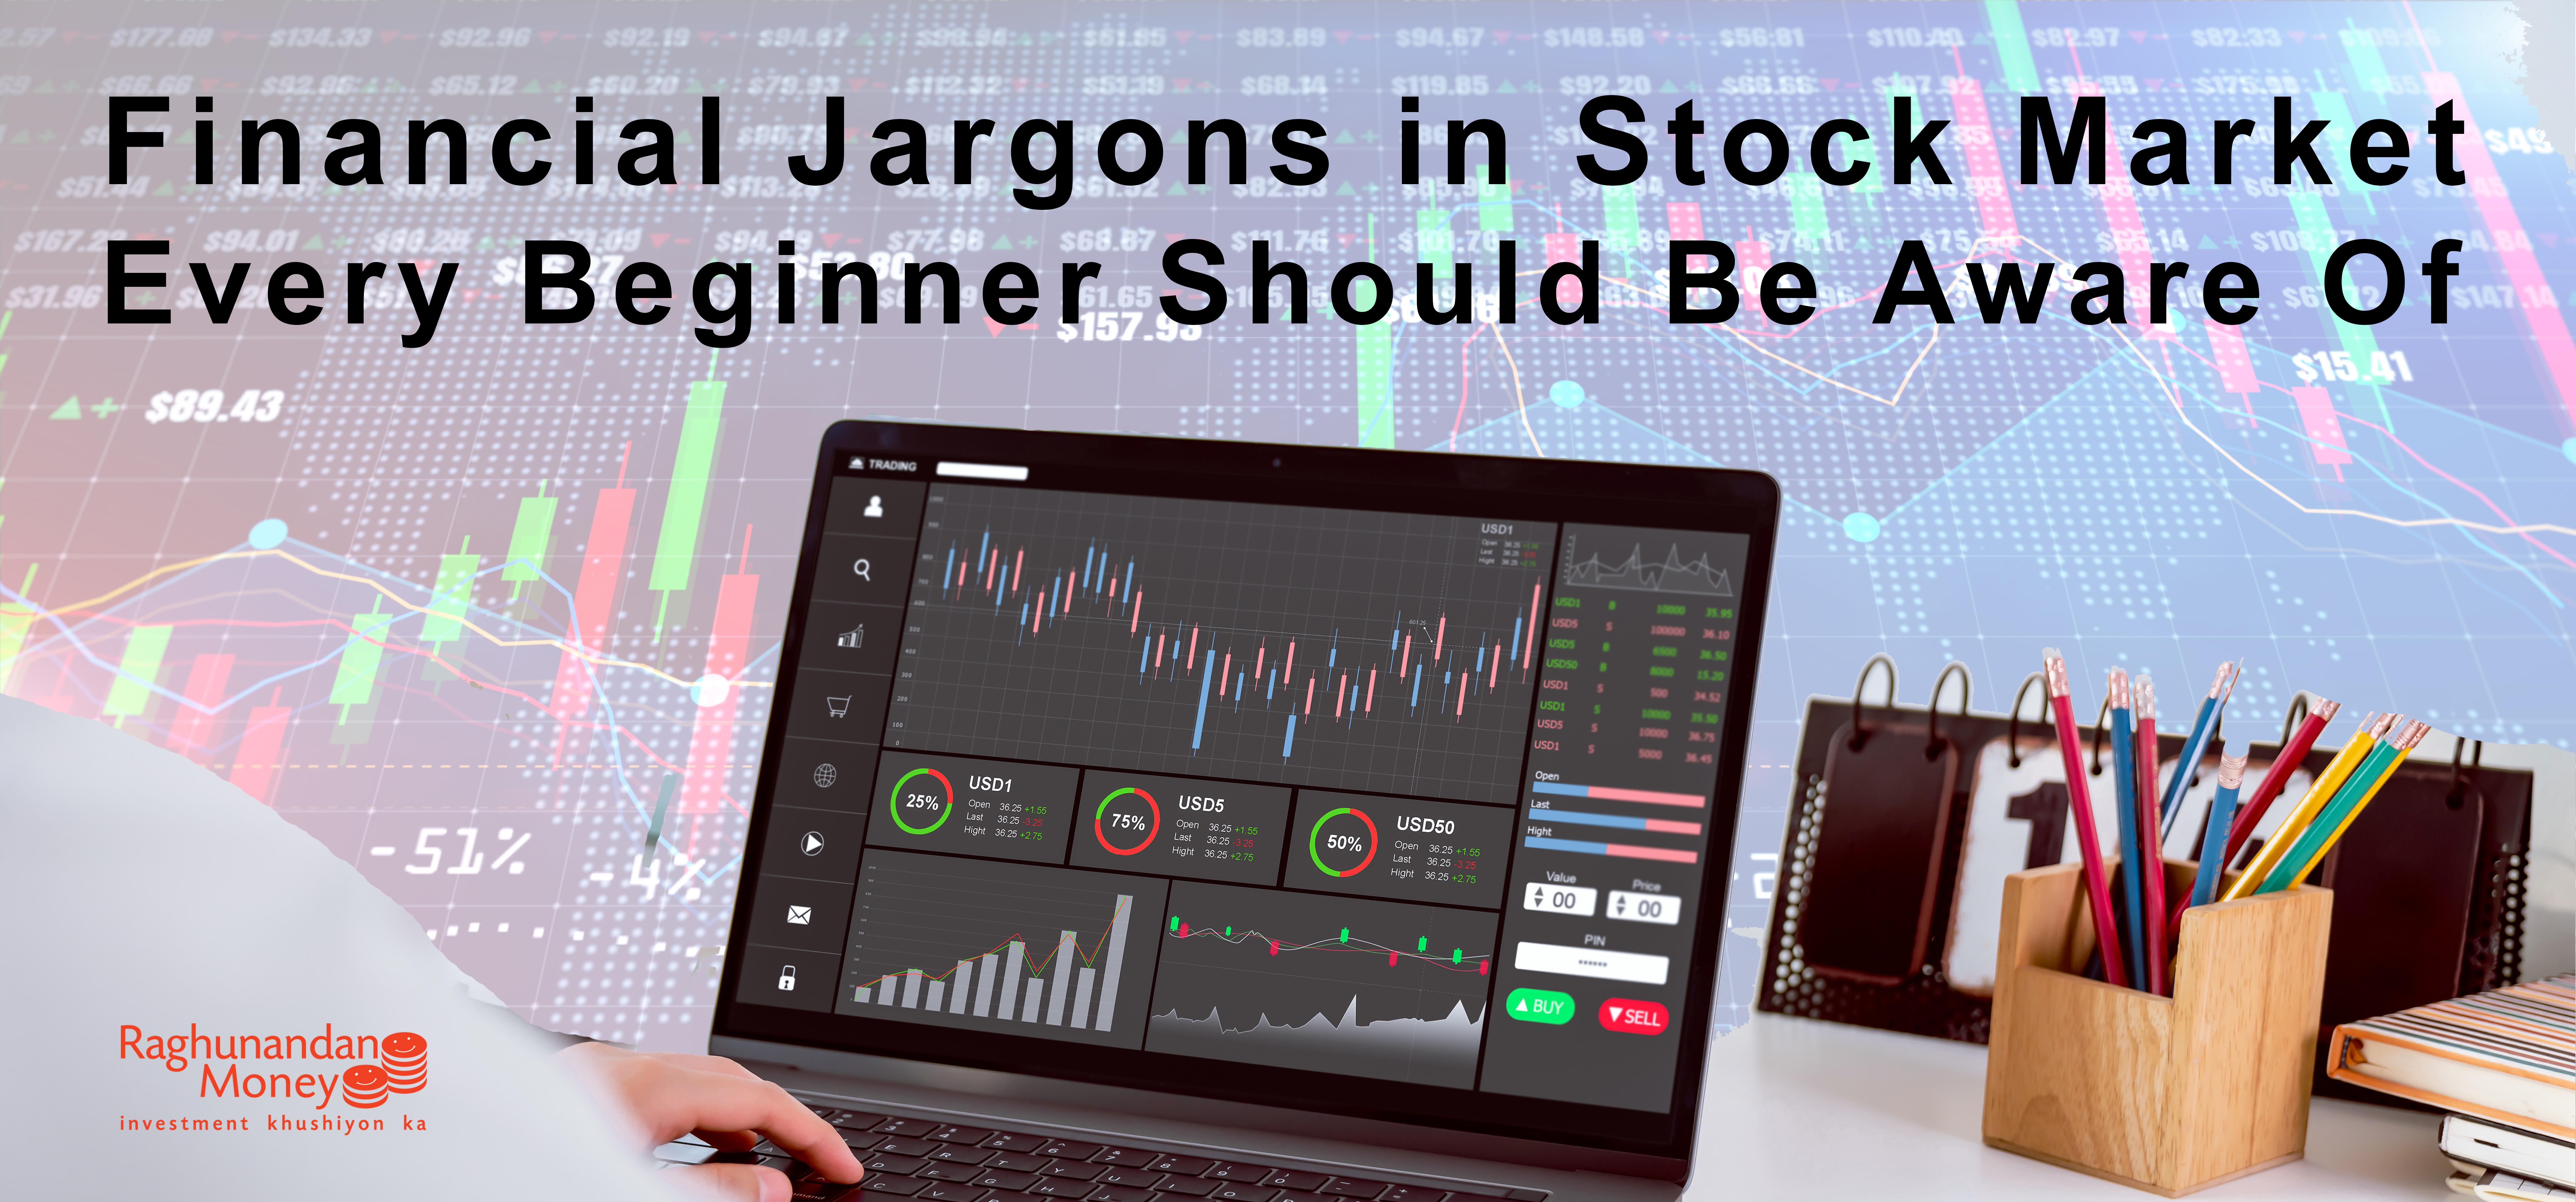 stock market jargon